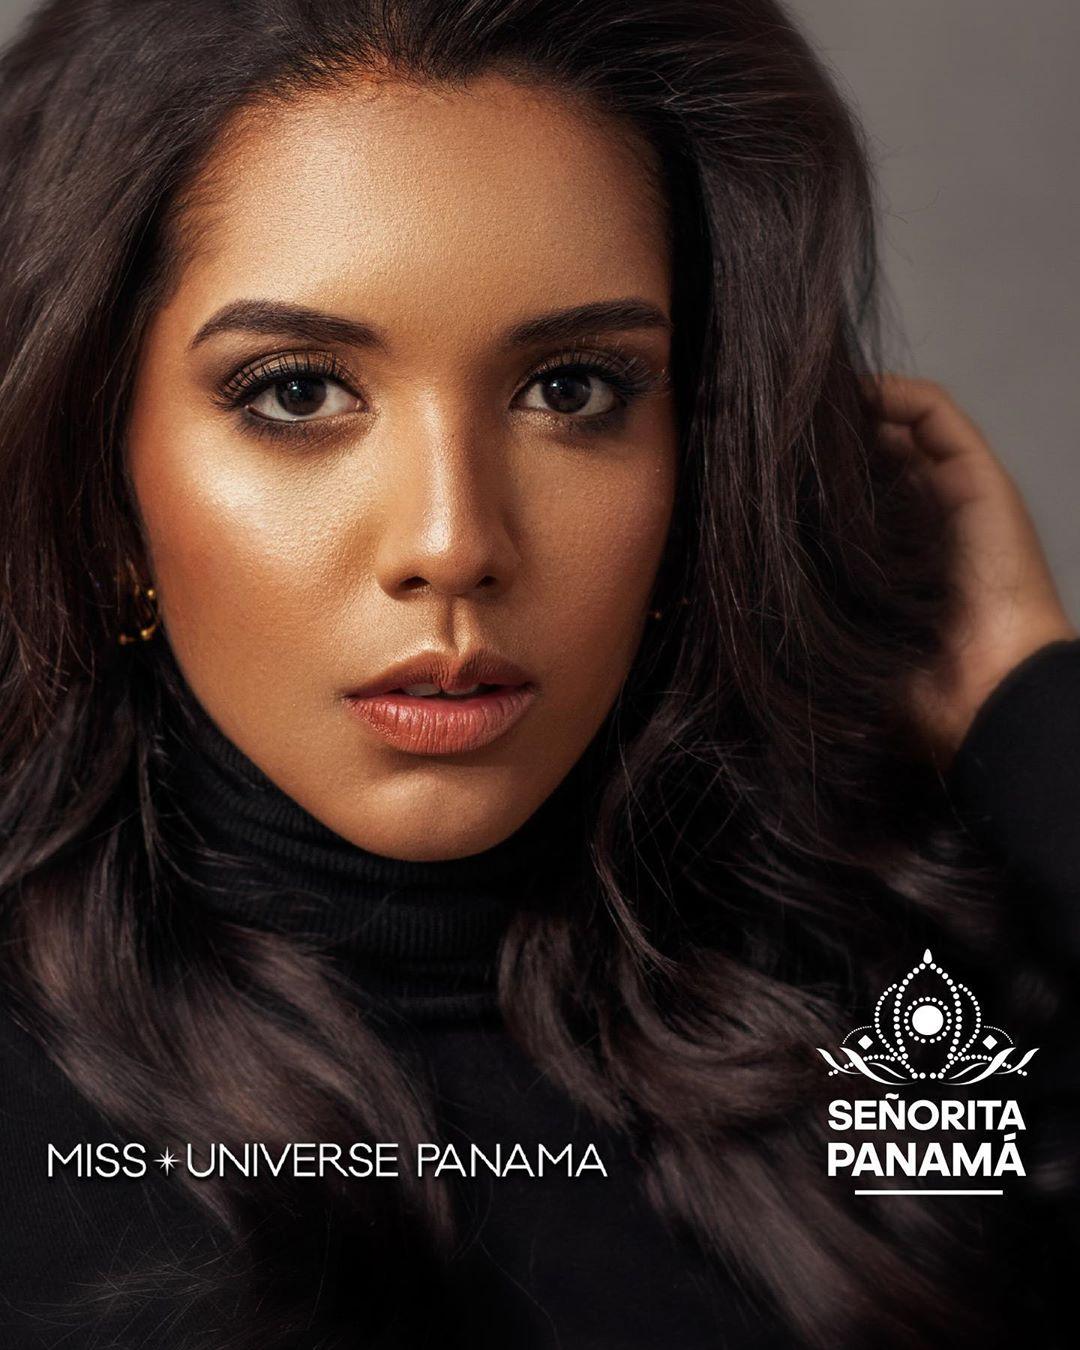 candidatas a senorita panama 2020. final: 16 may. - Página 2 Iittwu